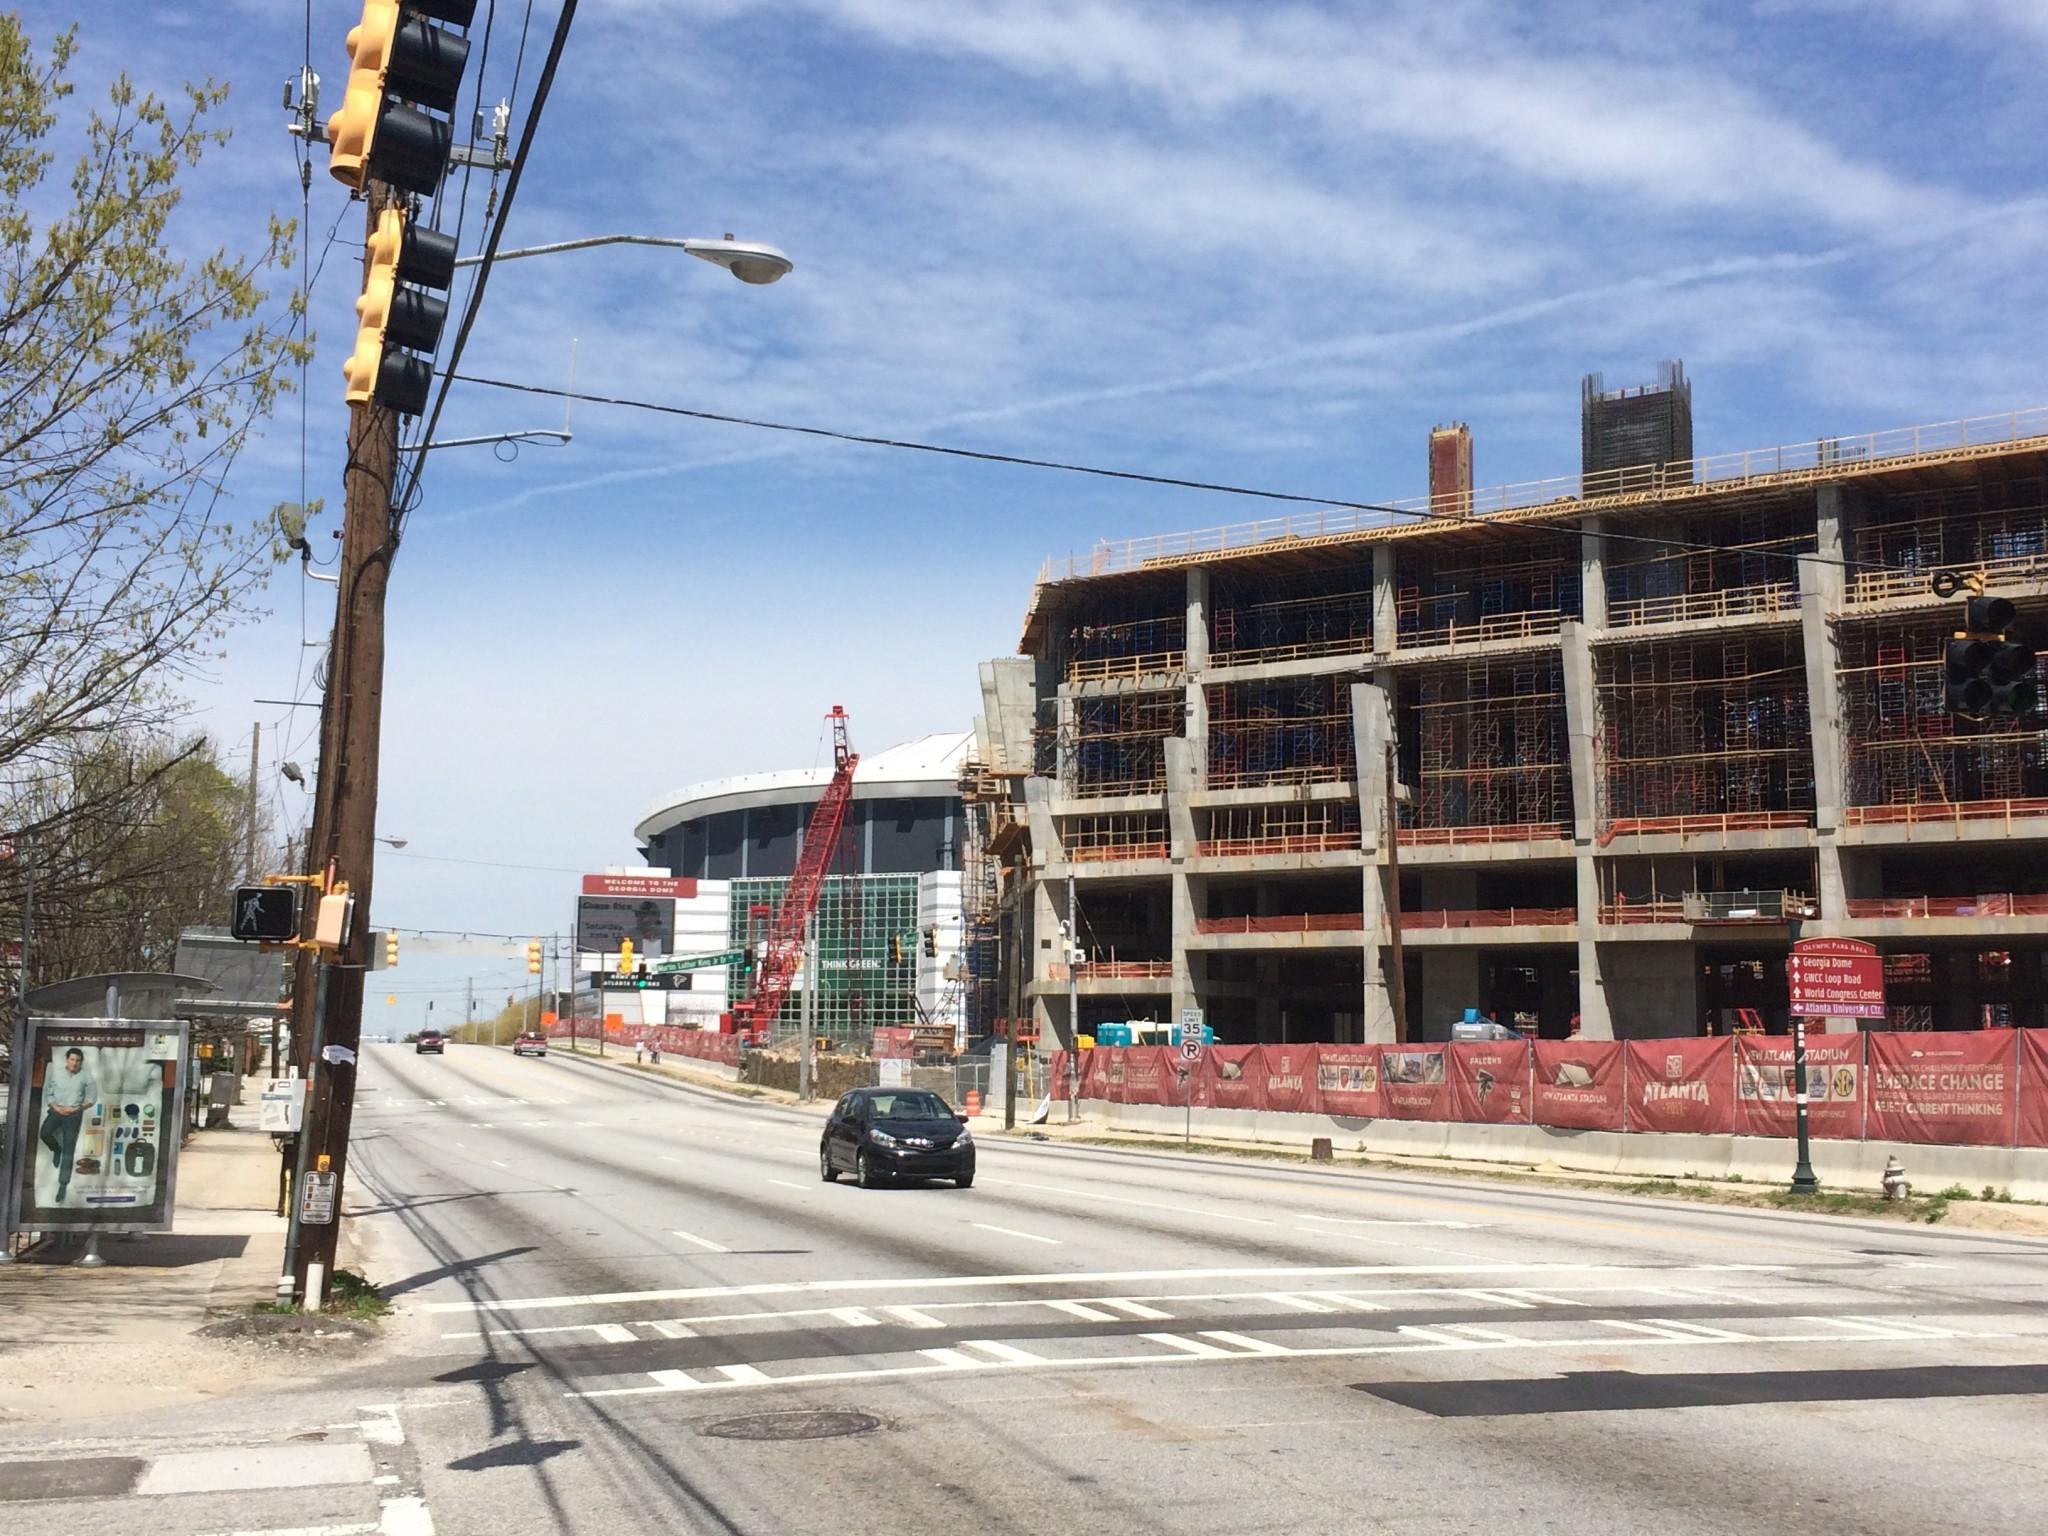 Falcons stadium April 5, 2015